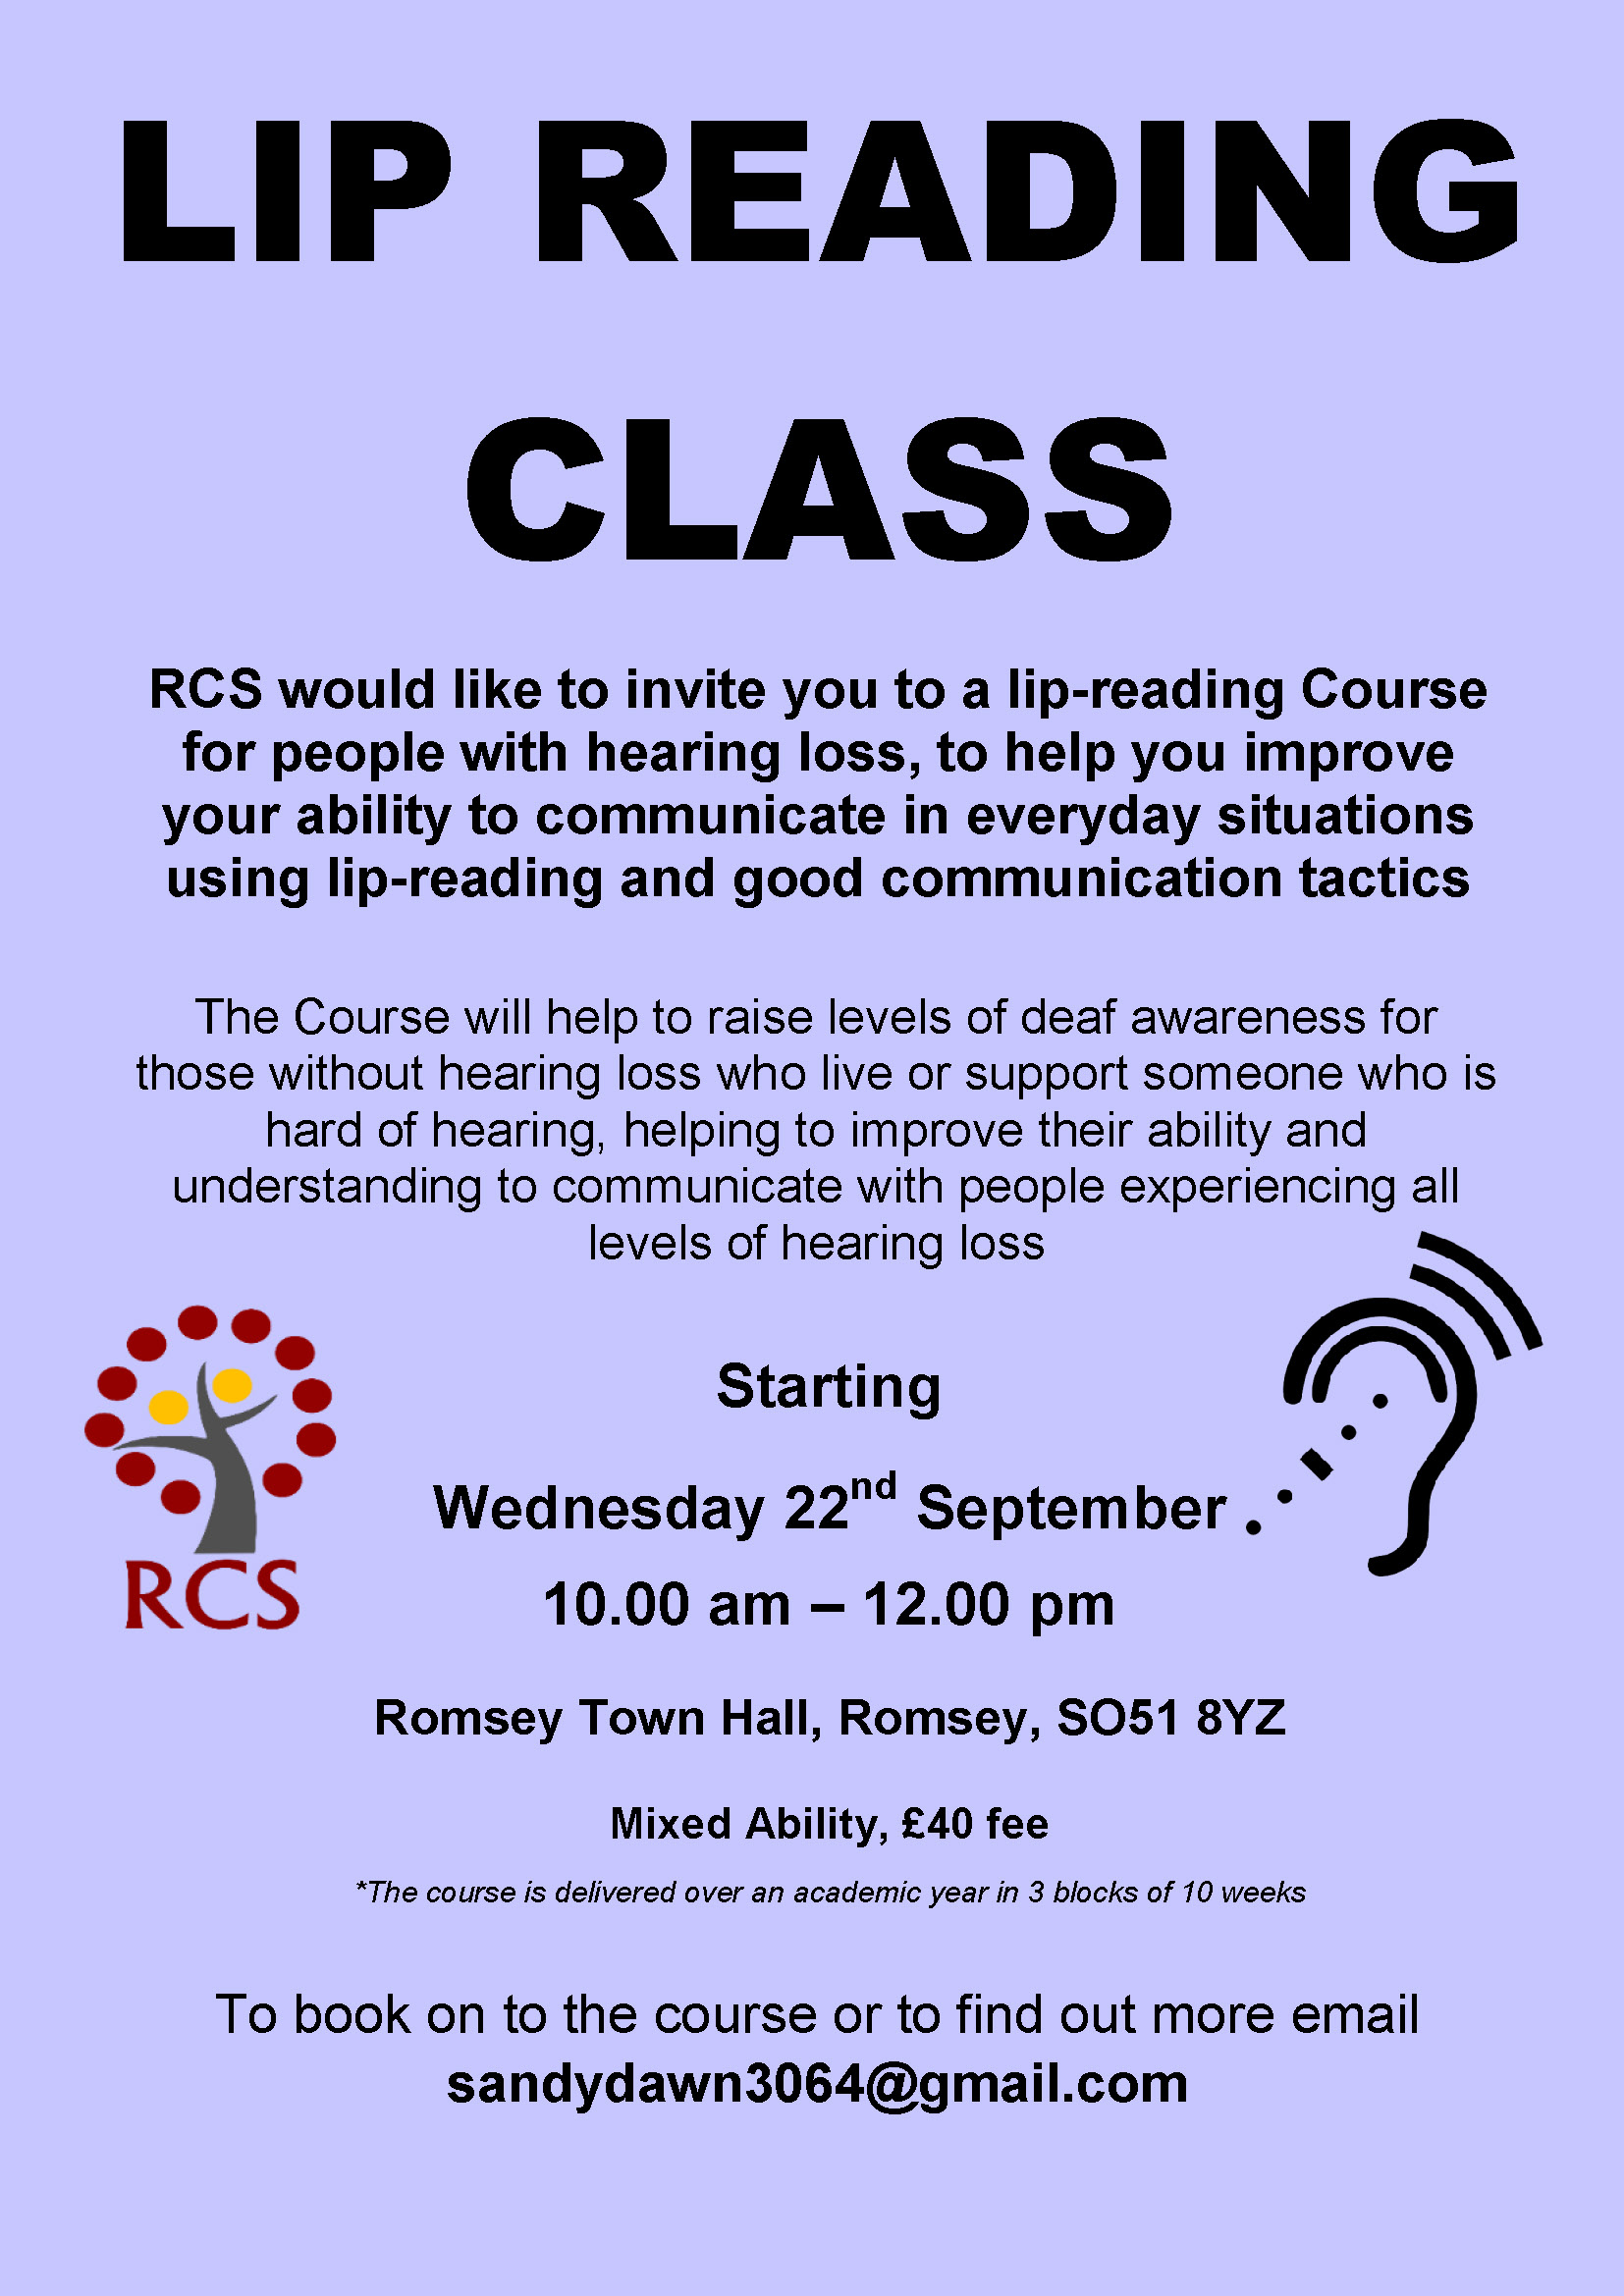 Lip Reading Class - Romsey